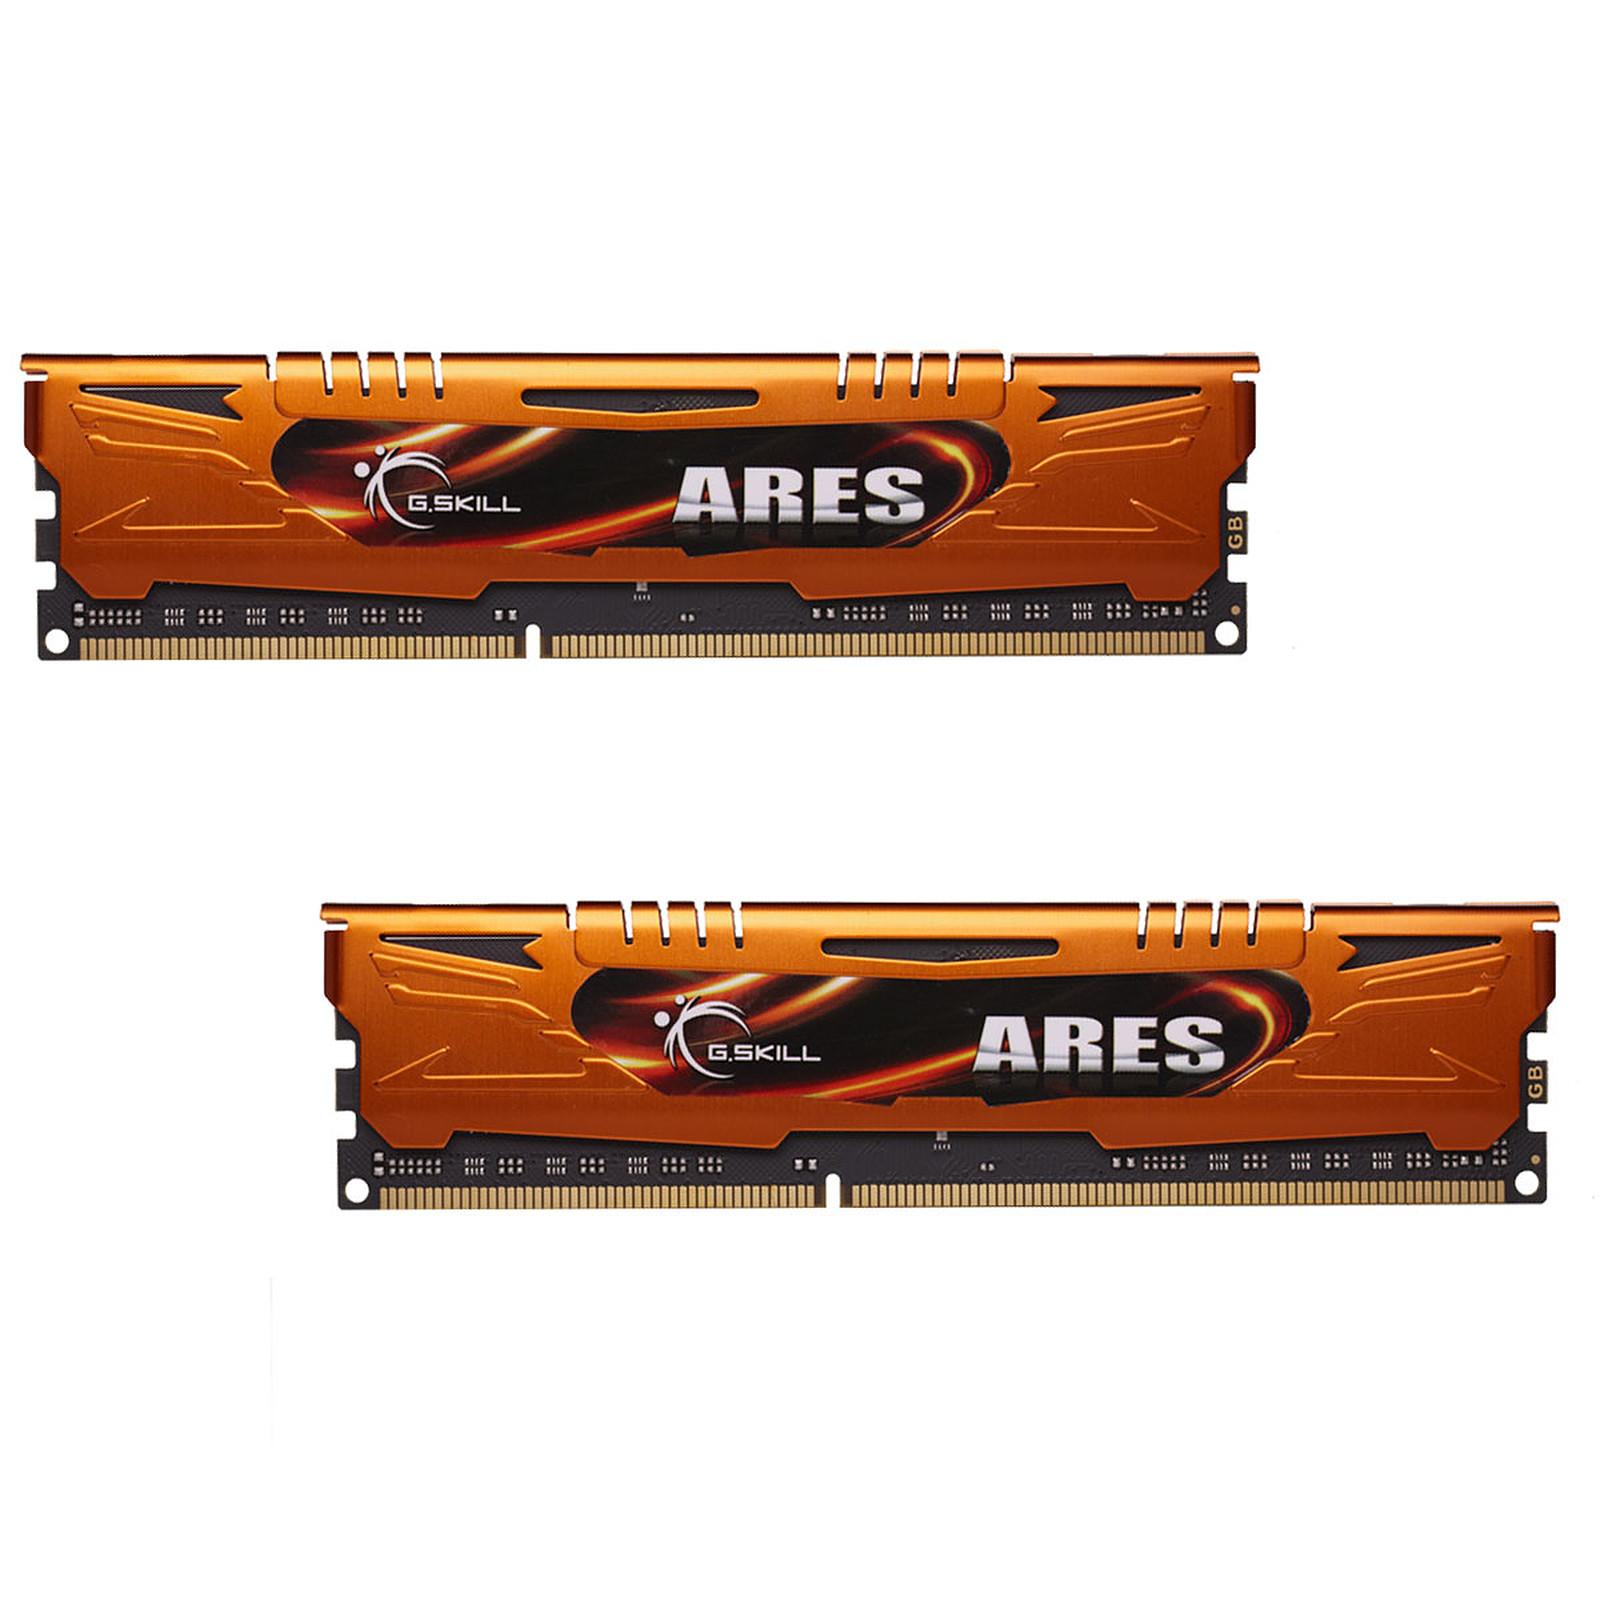 G.Skill Ares Orange Series 8 Go (2 x 4 Go) DDR3 1600 MHz CL9